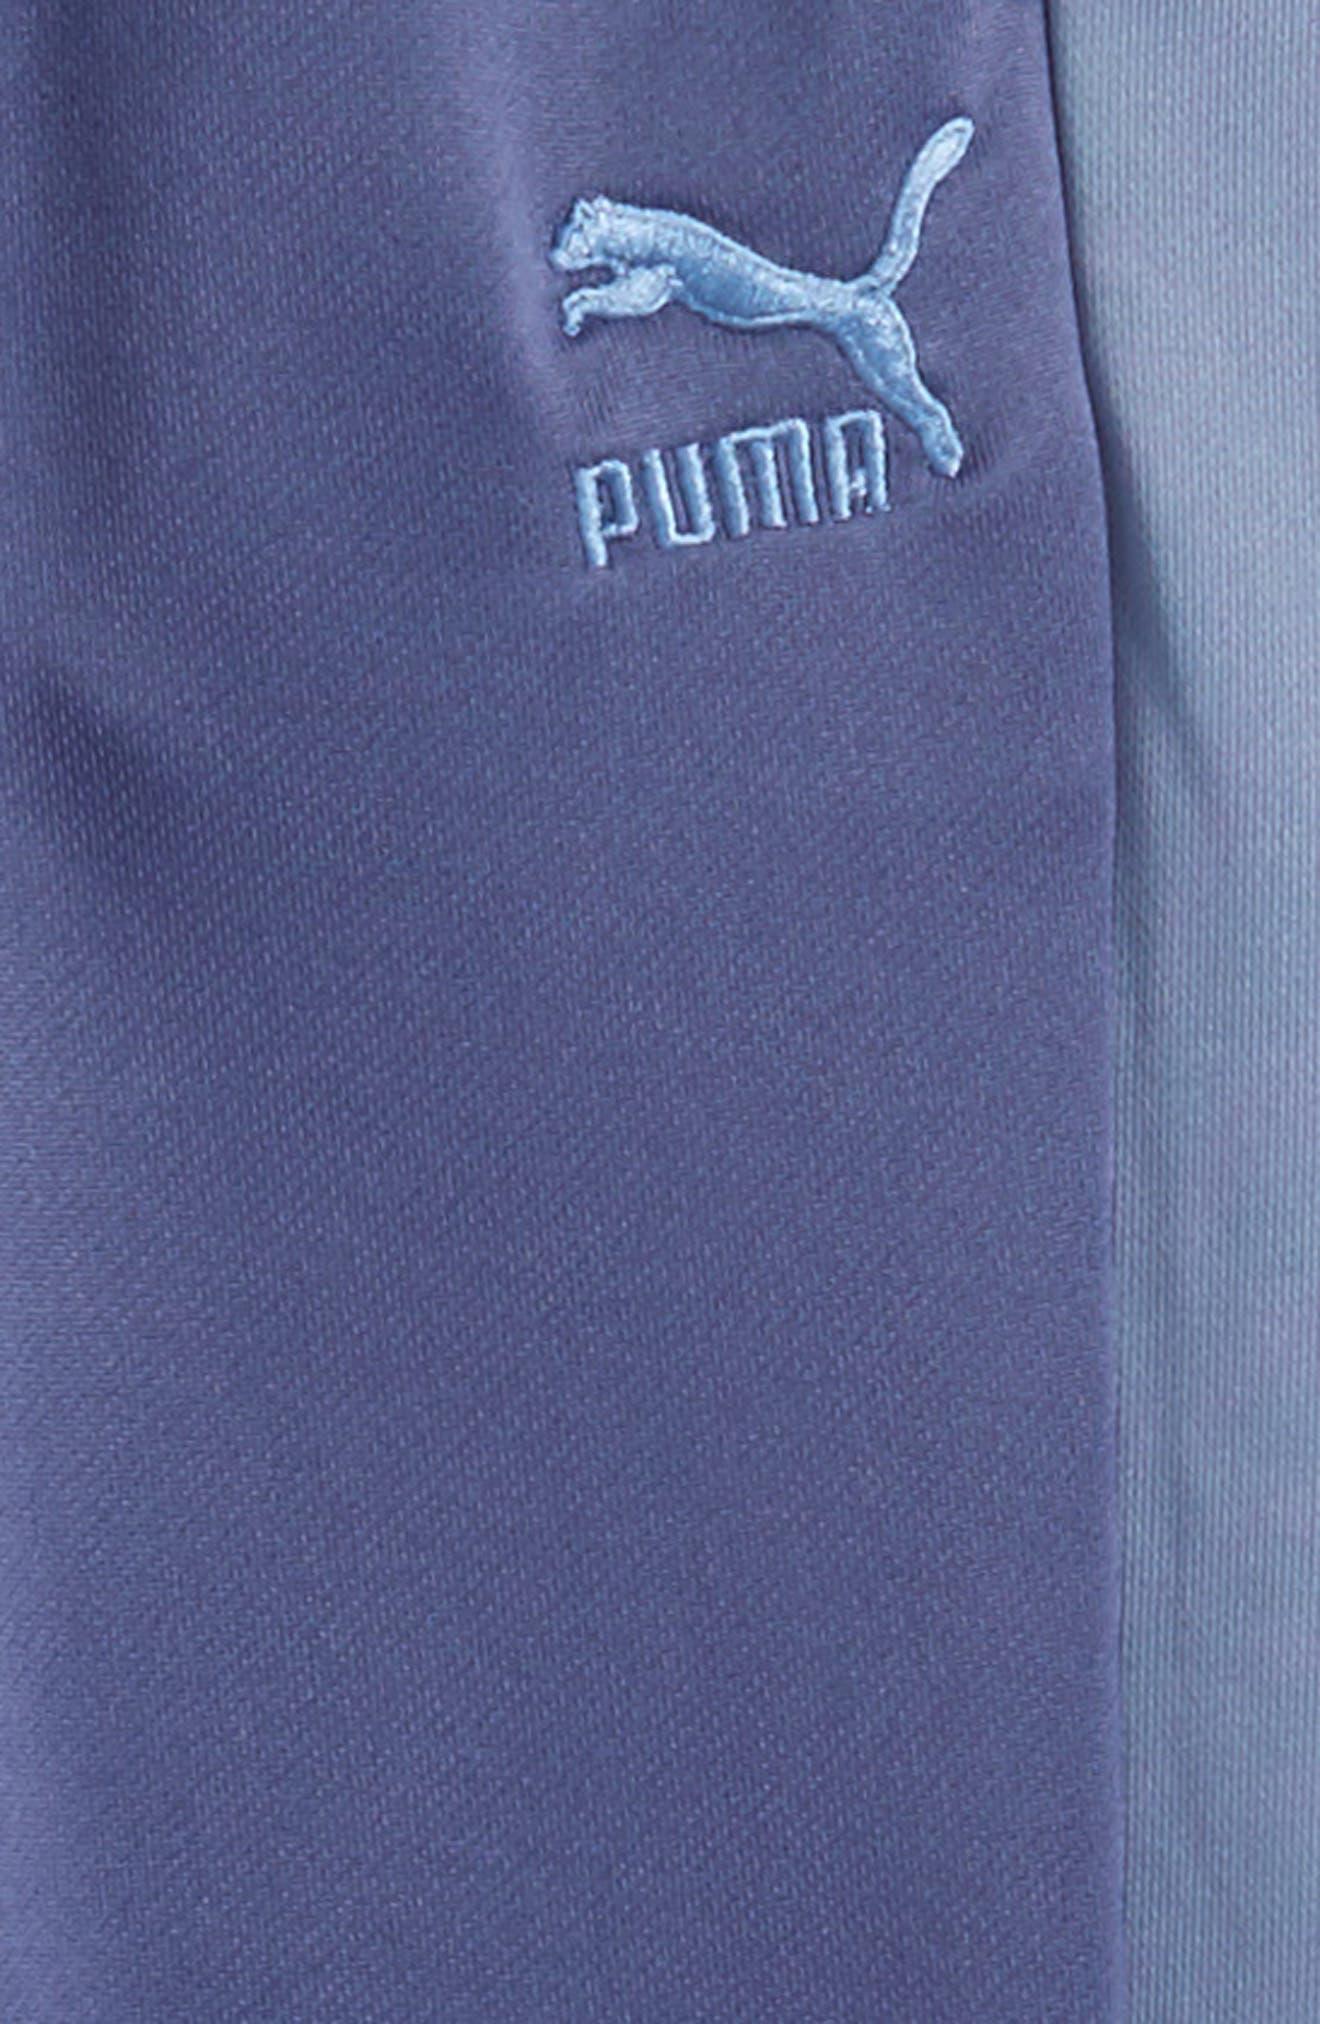 T7 Sweatpants,                             Alternate thumbnail 2, color,                             Blue Indigo